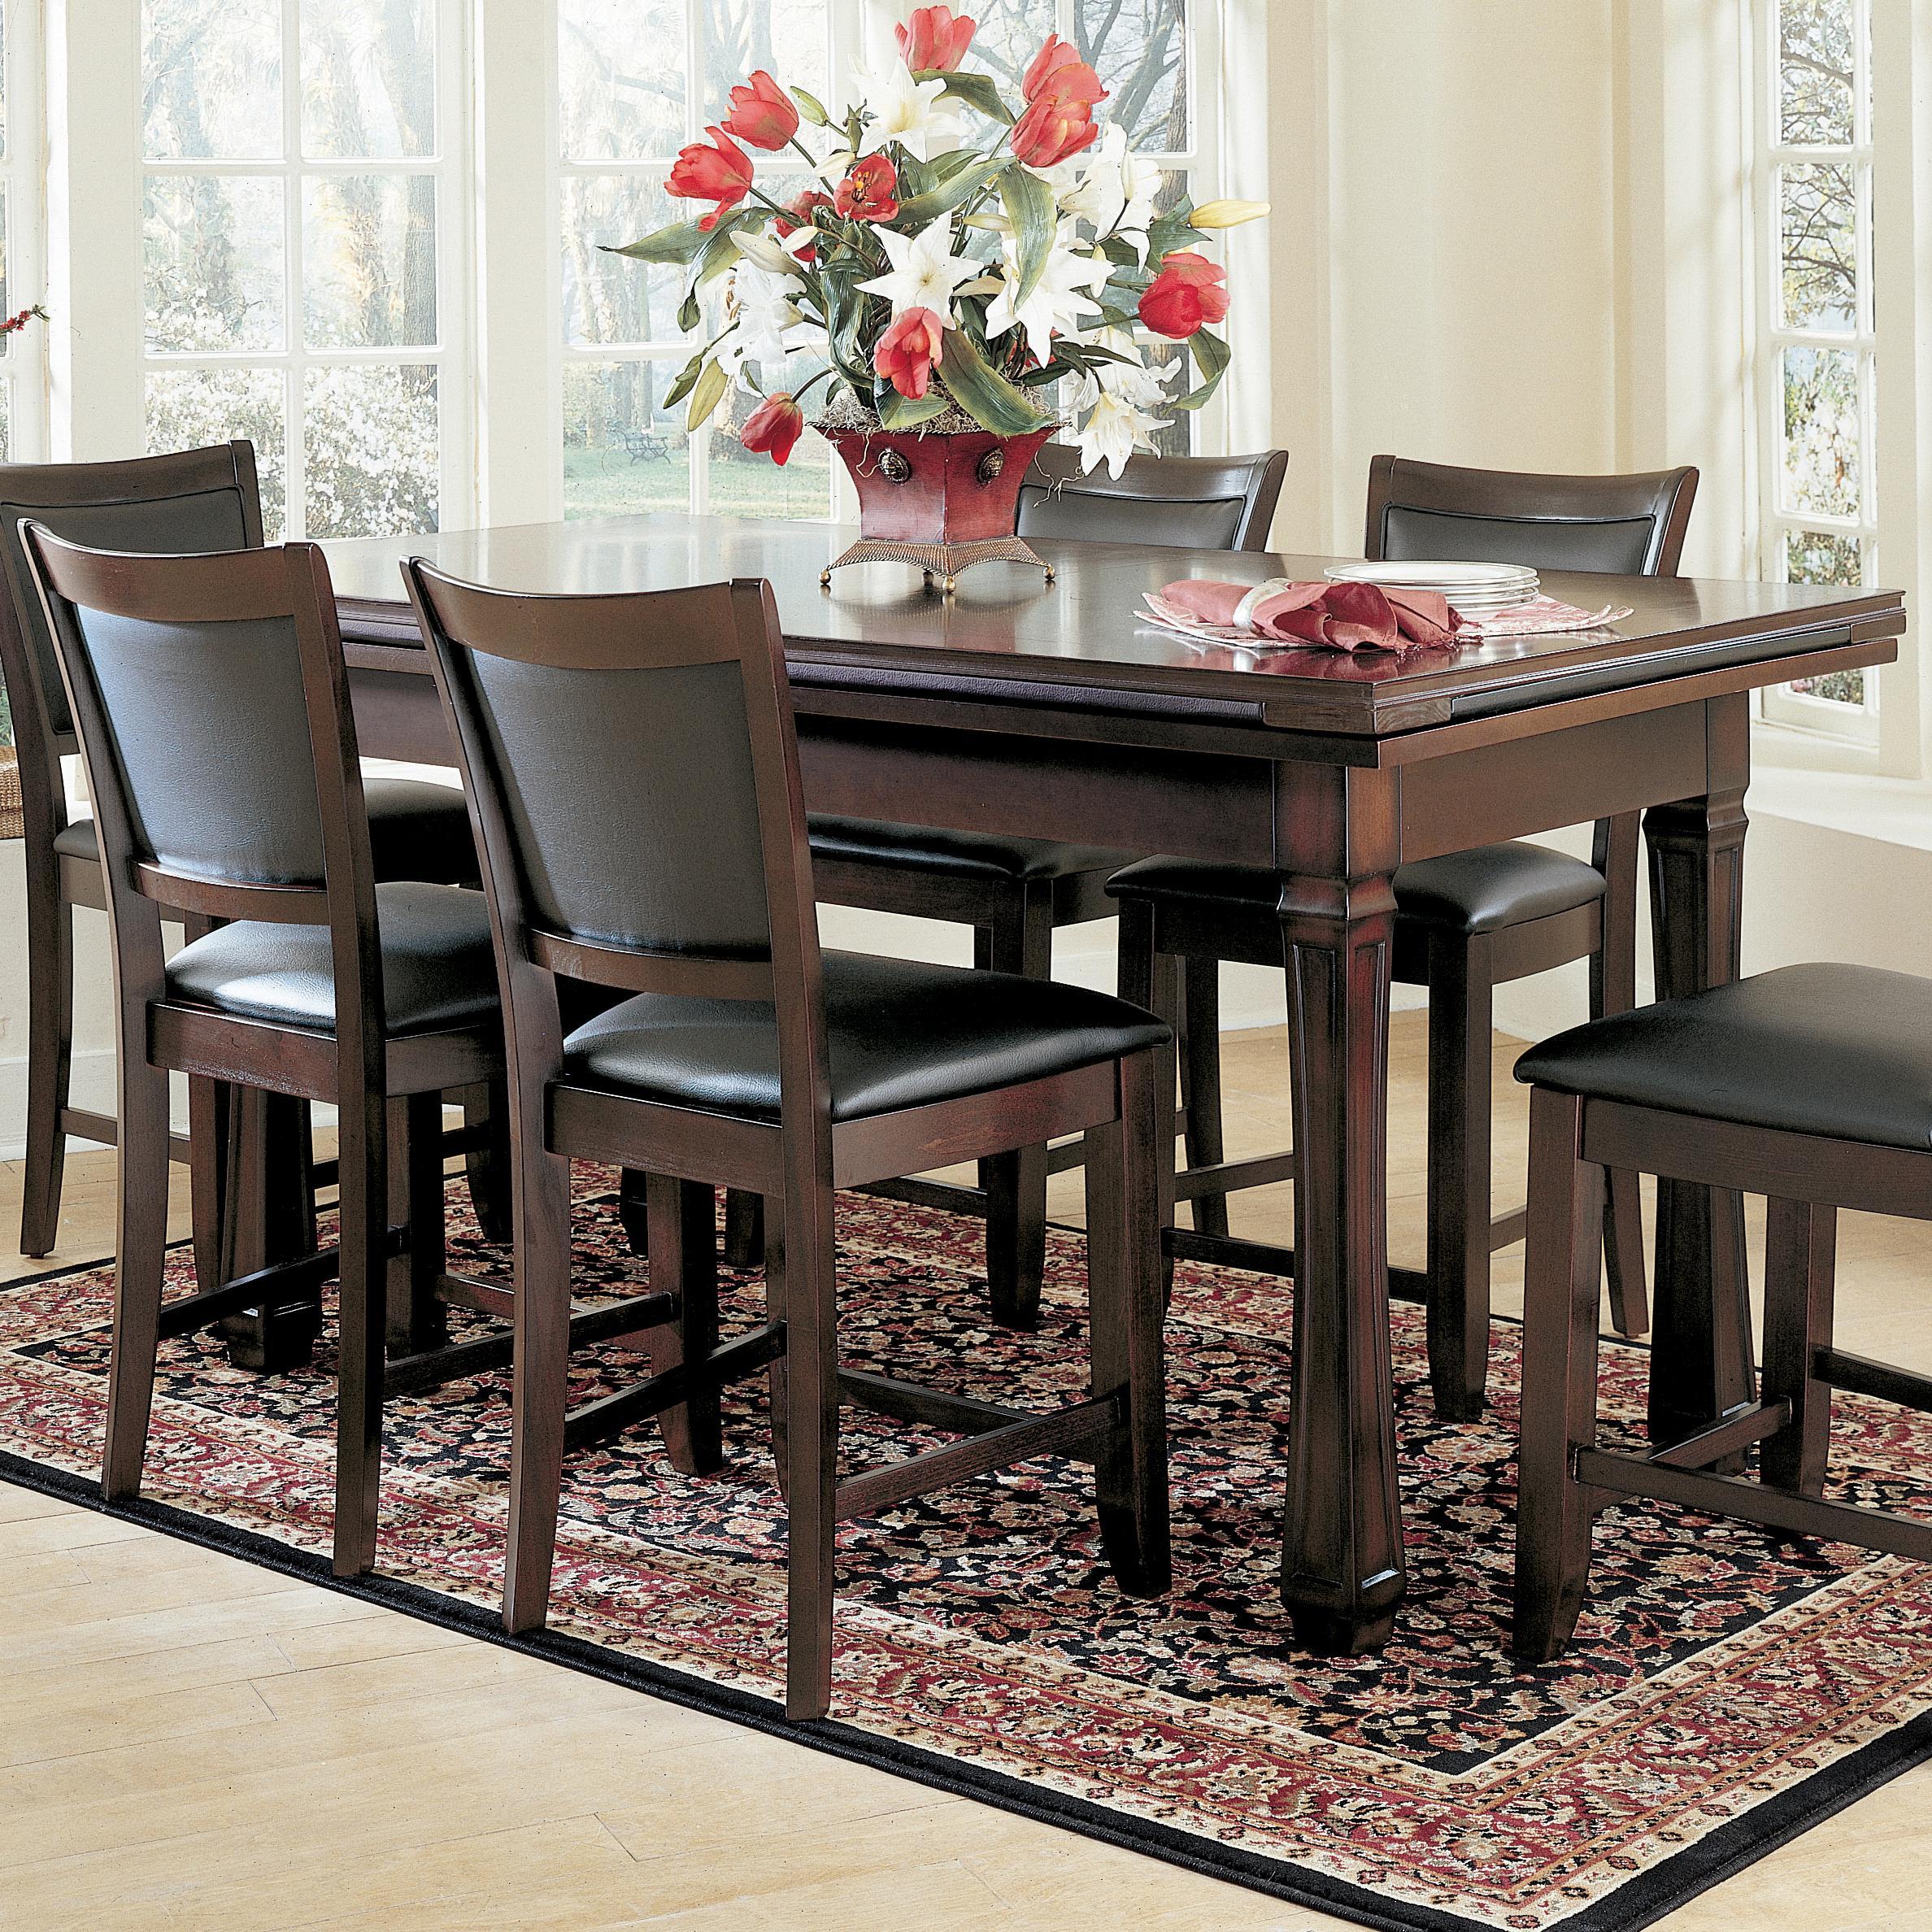 American Heritage Billiards Burlington High Tops Craps Table   Becker  Furniture World   Game Table